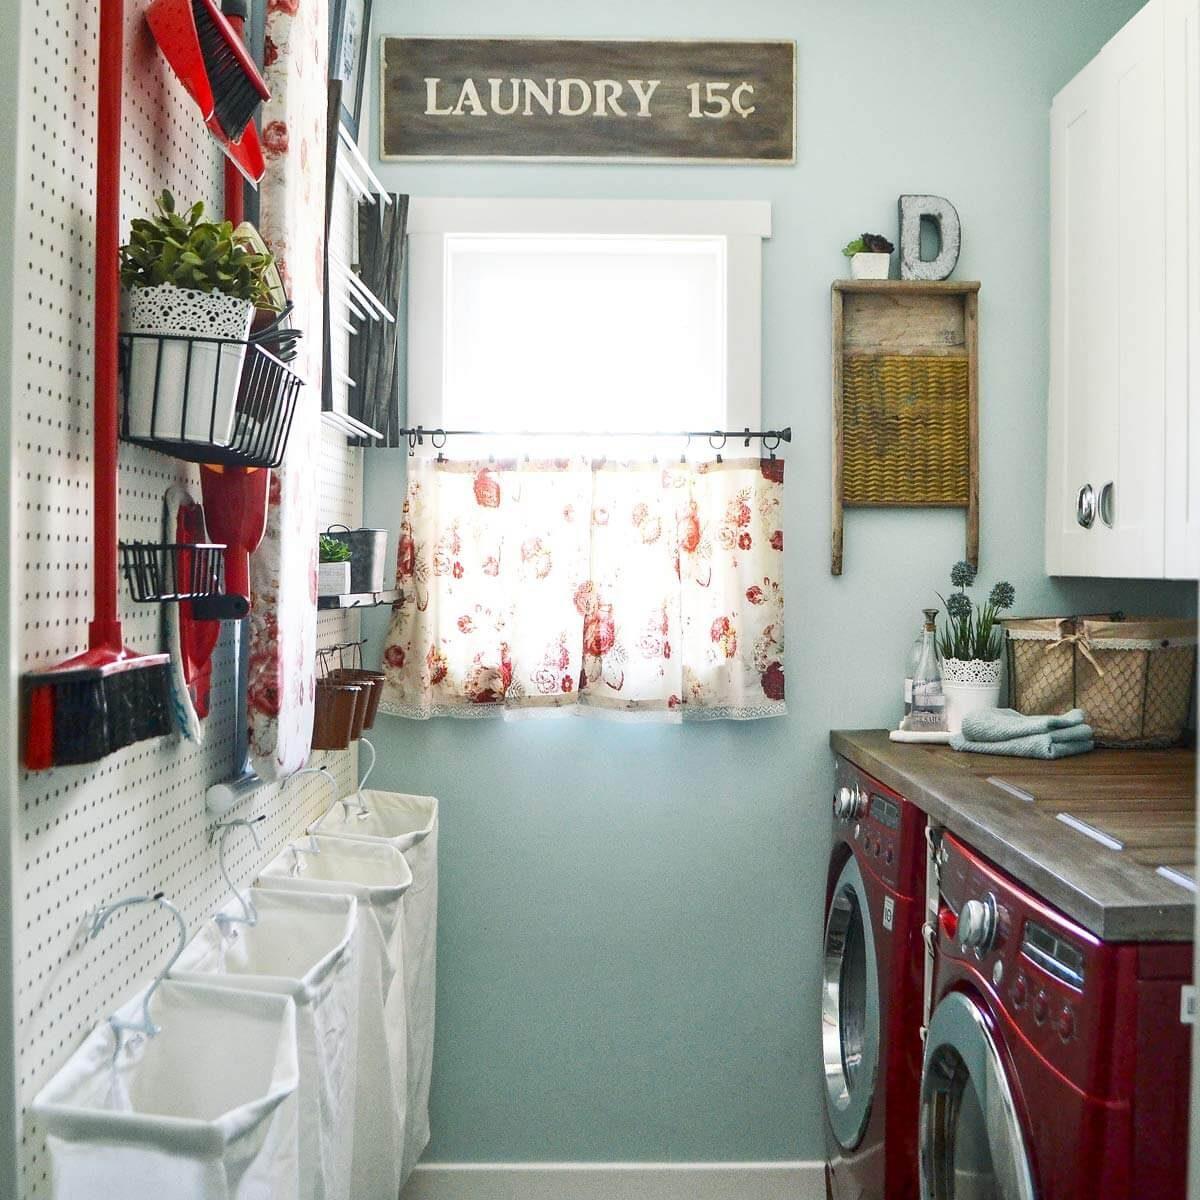 DSC_0035 country woman laundry room organization peg board